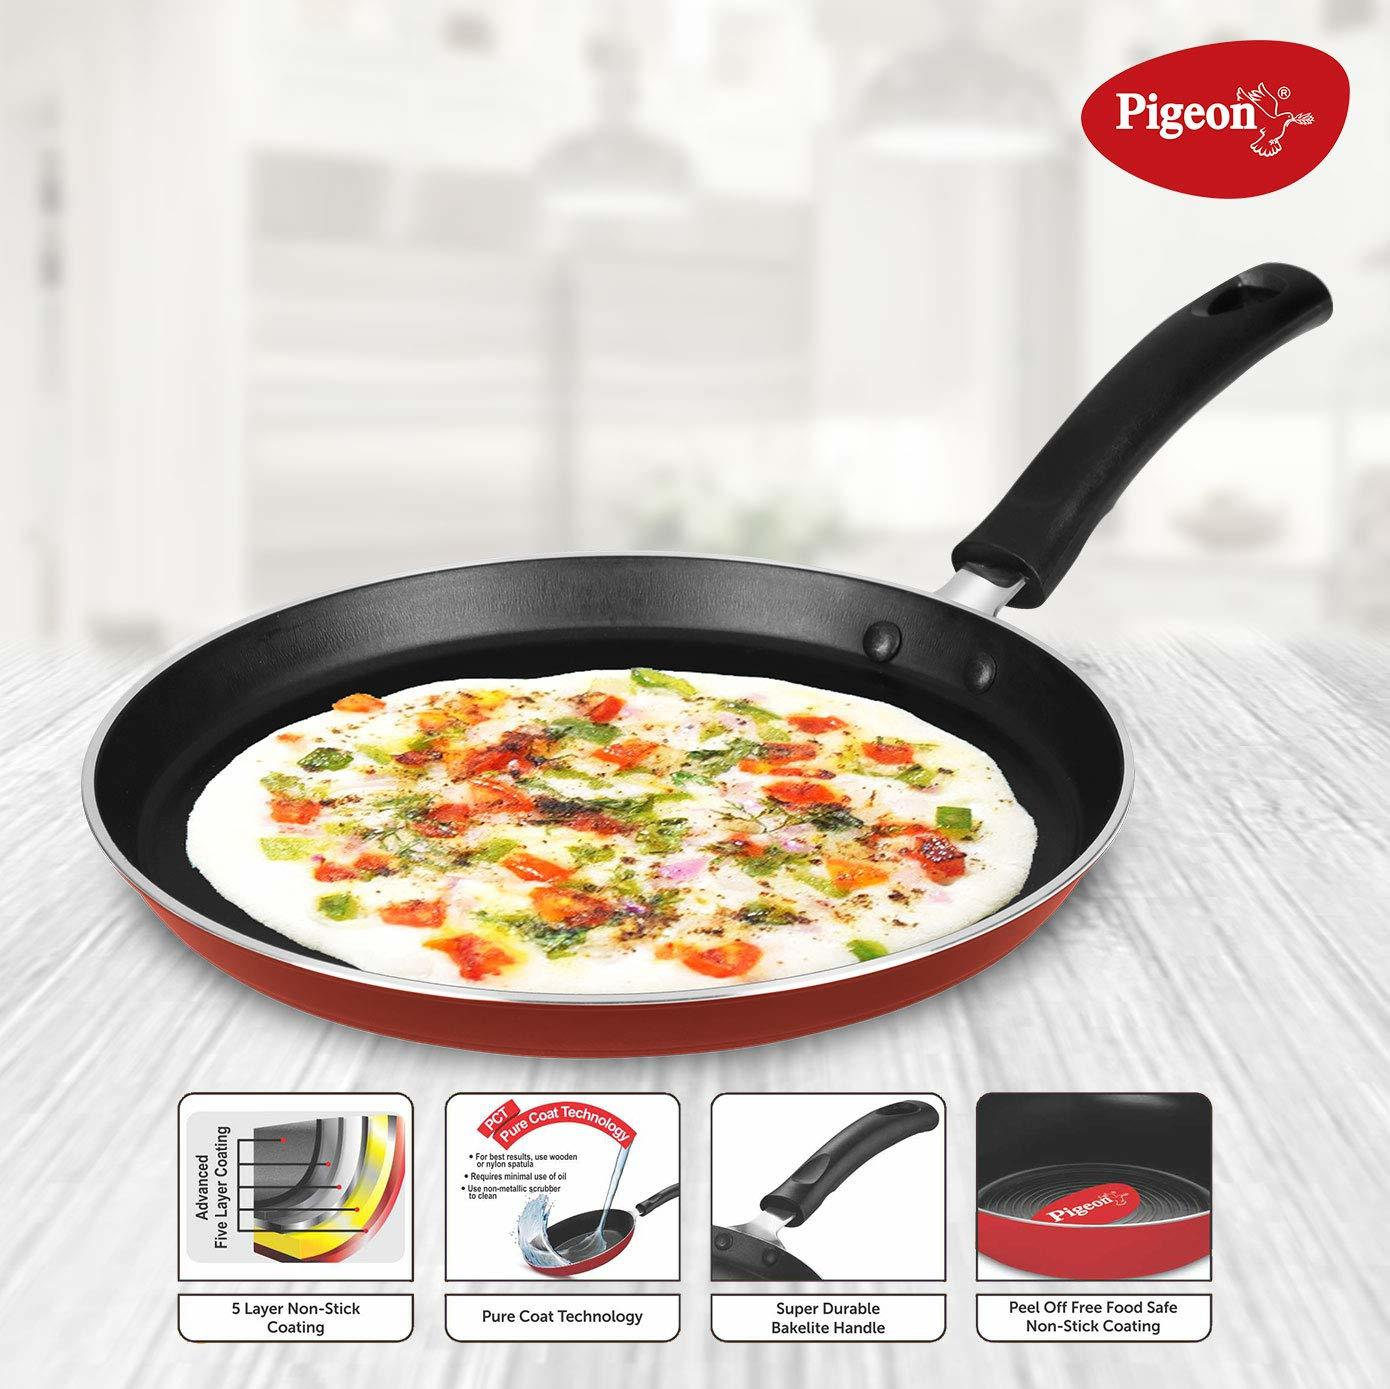 Pigeon by Stovekraft Basics Induction Base Non-Stick Aluminium Cookware Set, Terracotta Brown